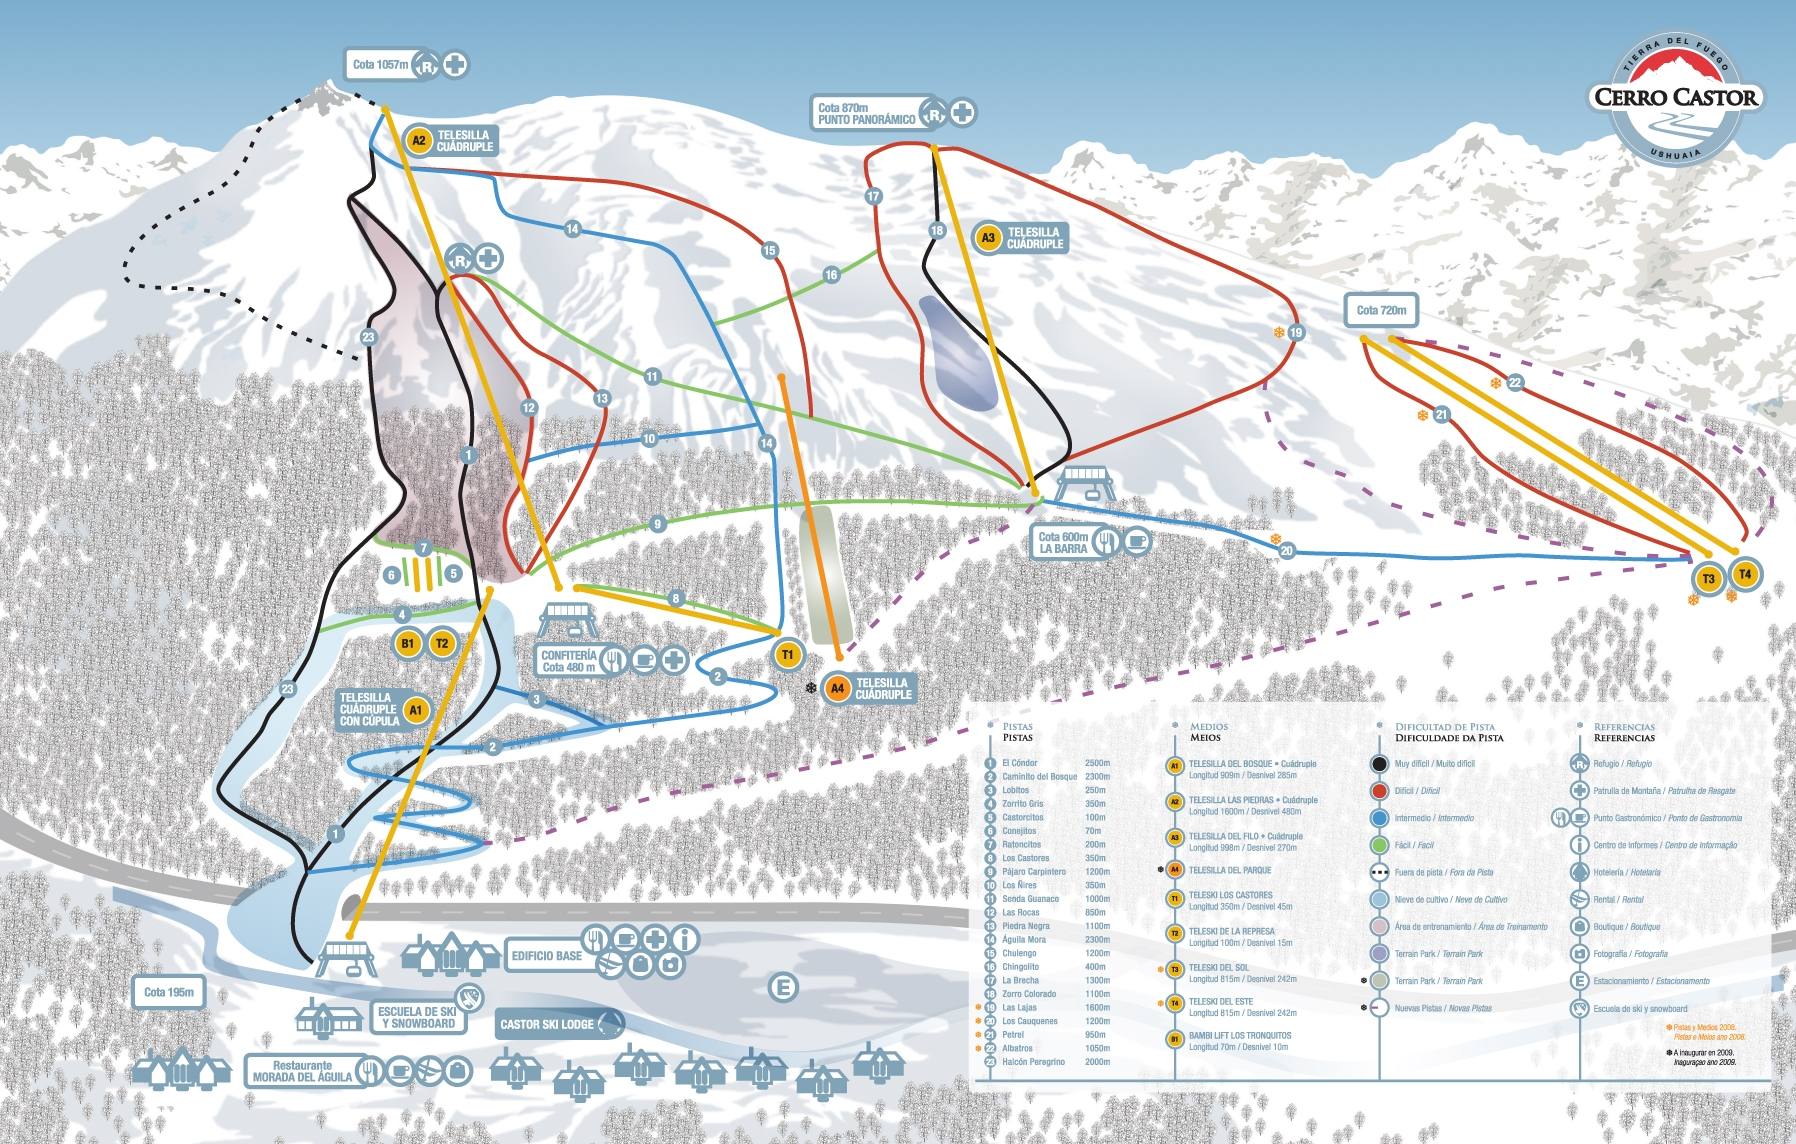 mapa Cerro Castor